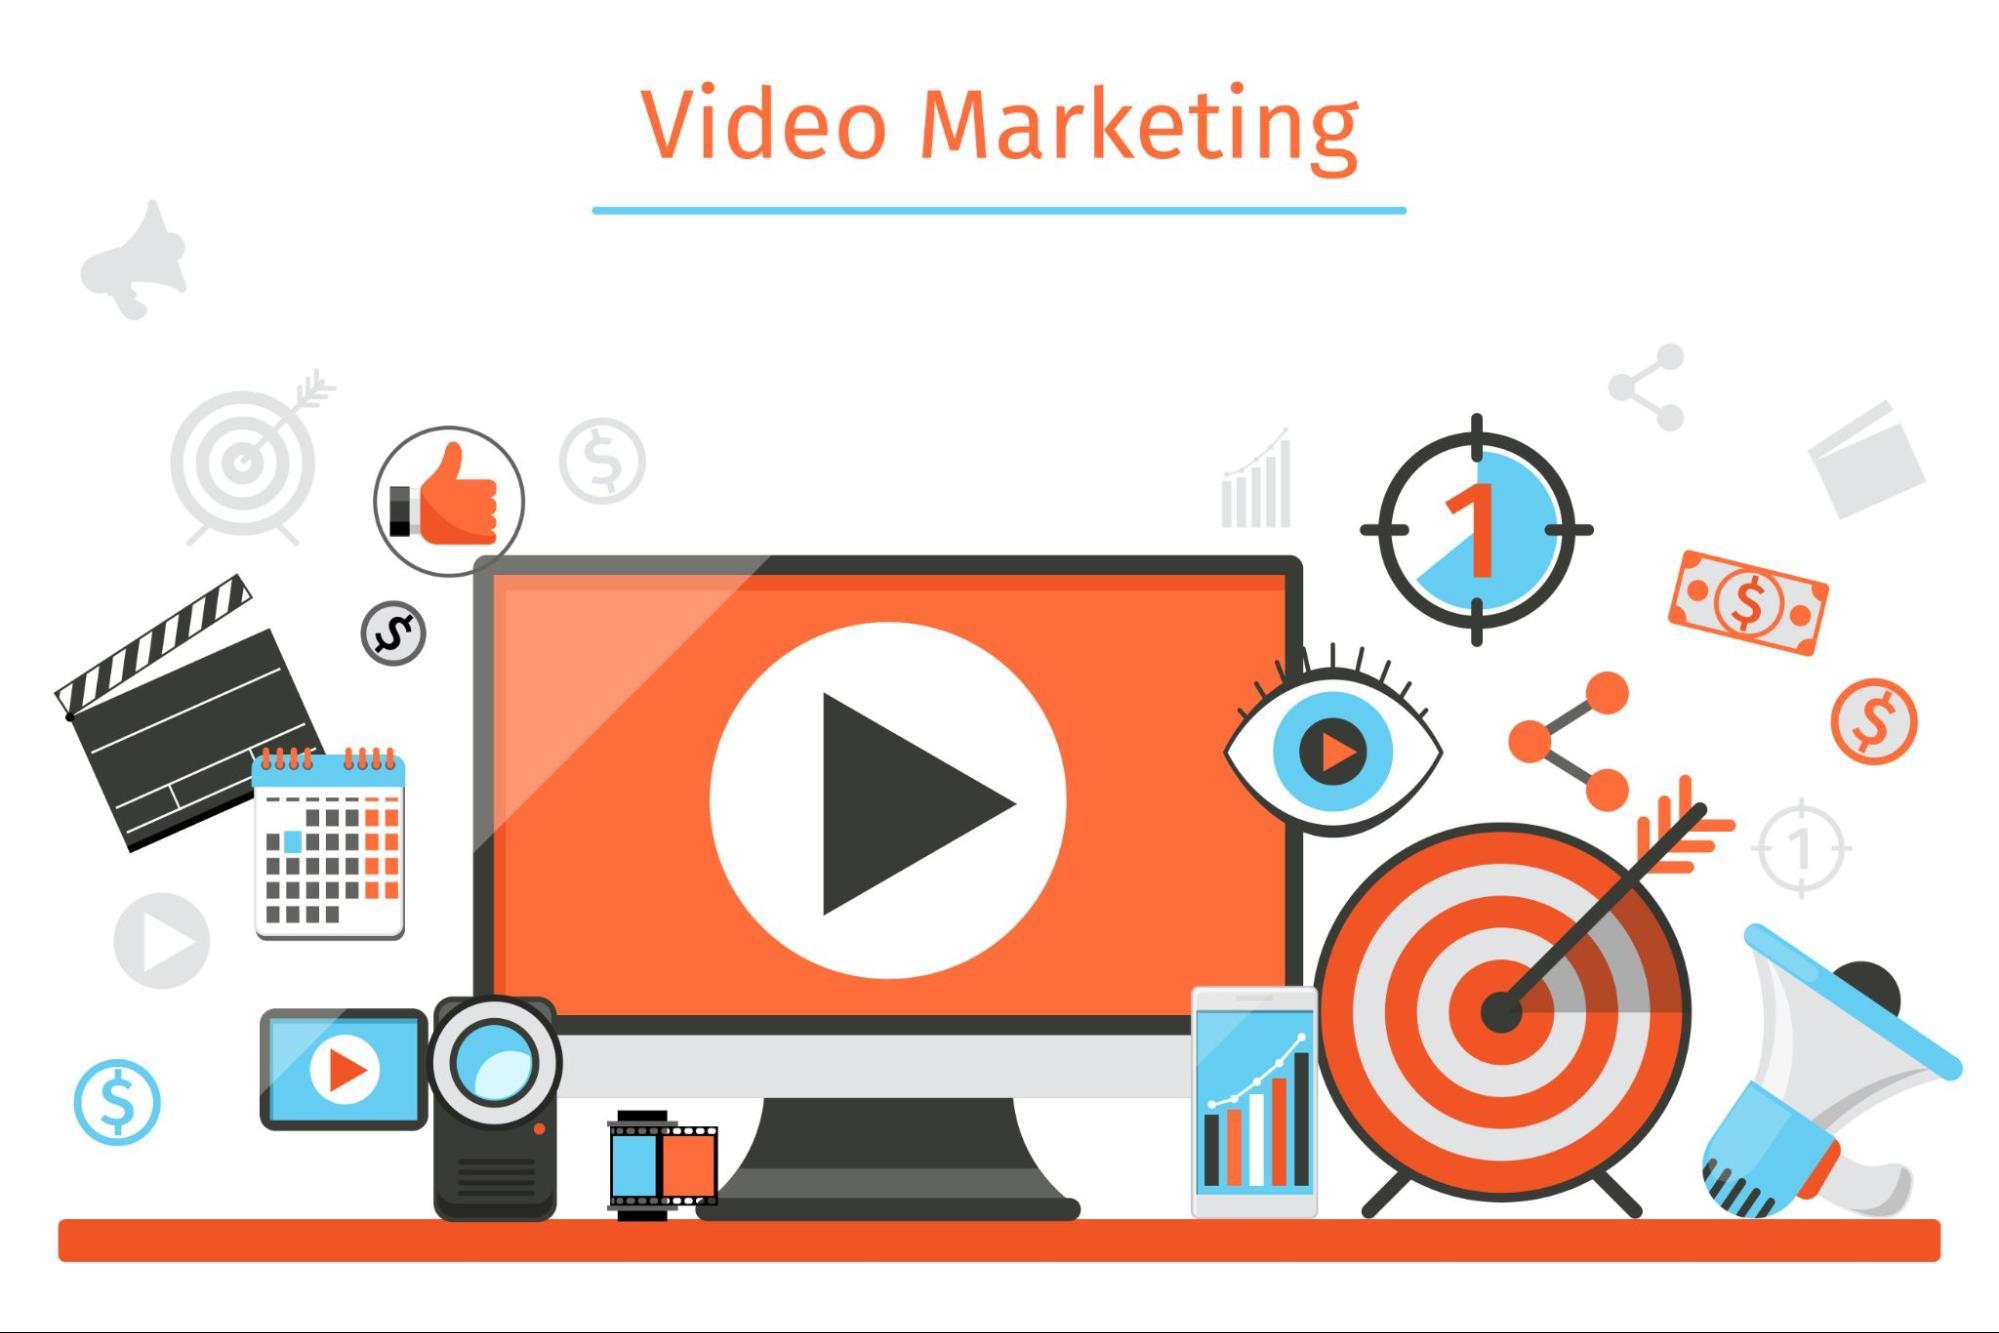 5 Common Video Marketing Mistakes to Avoid